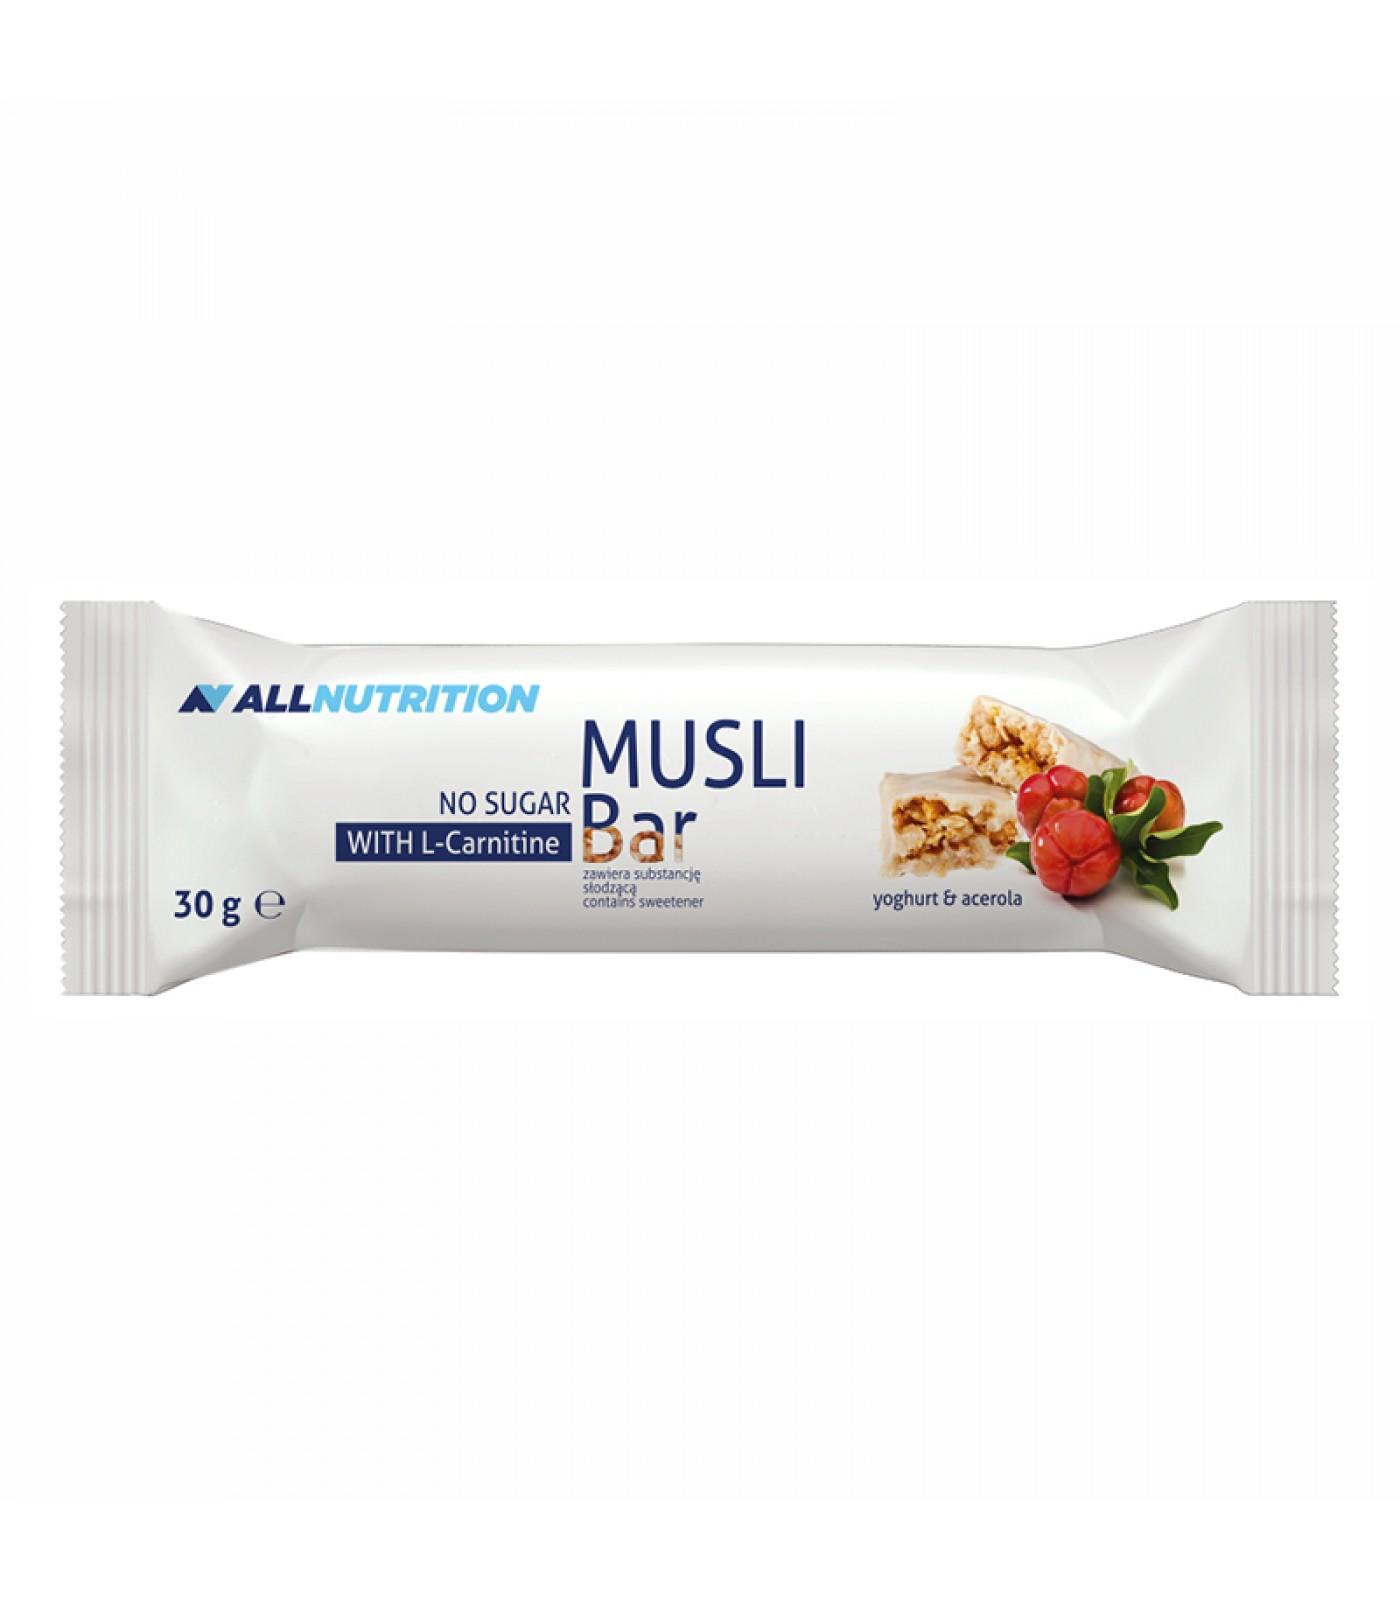 Allnutrition Musli Bar + L-Carnitine